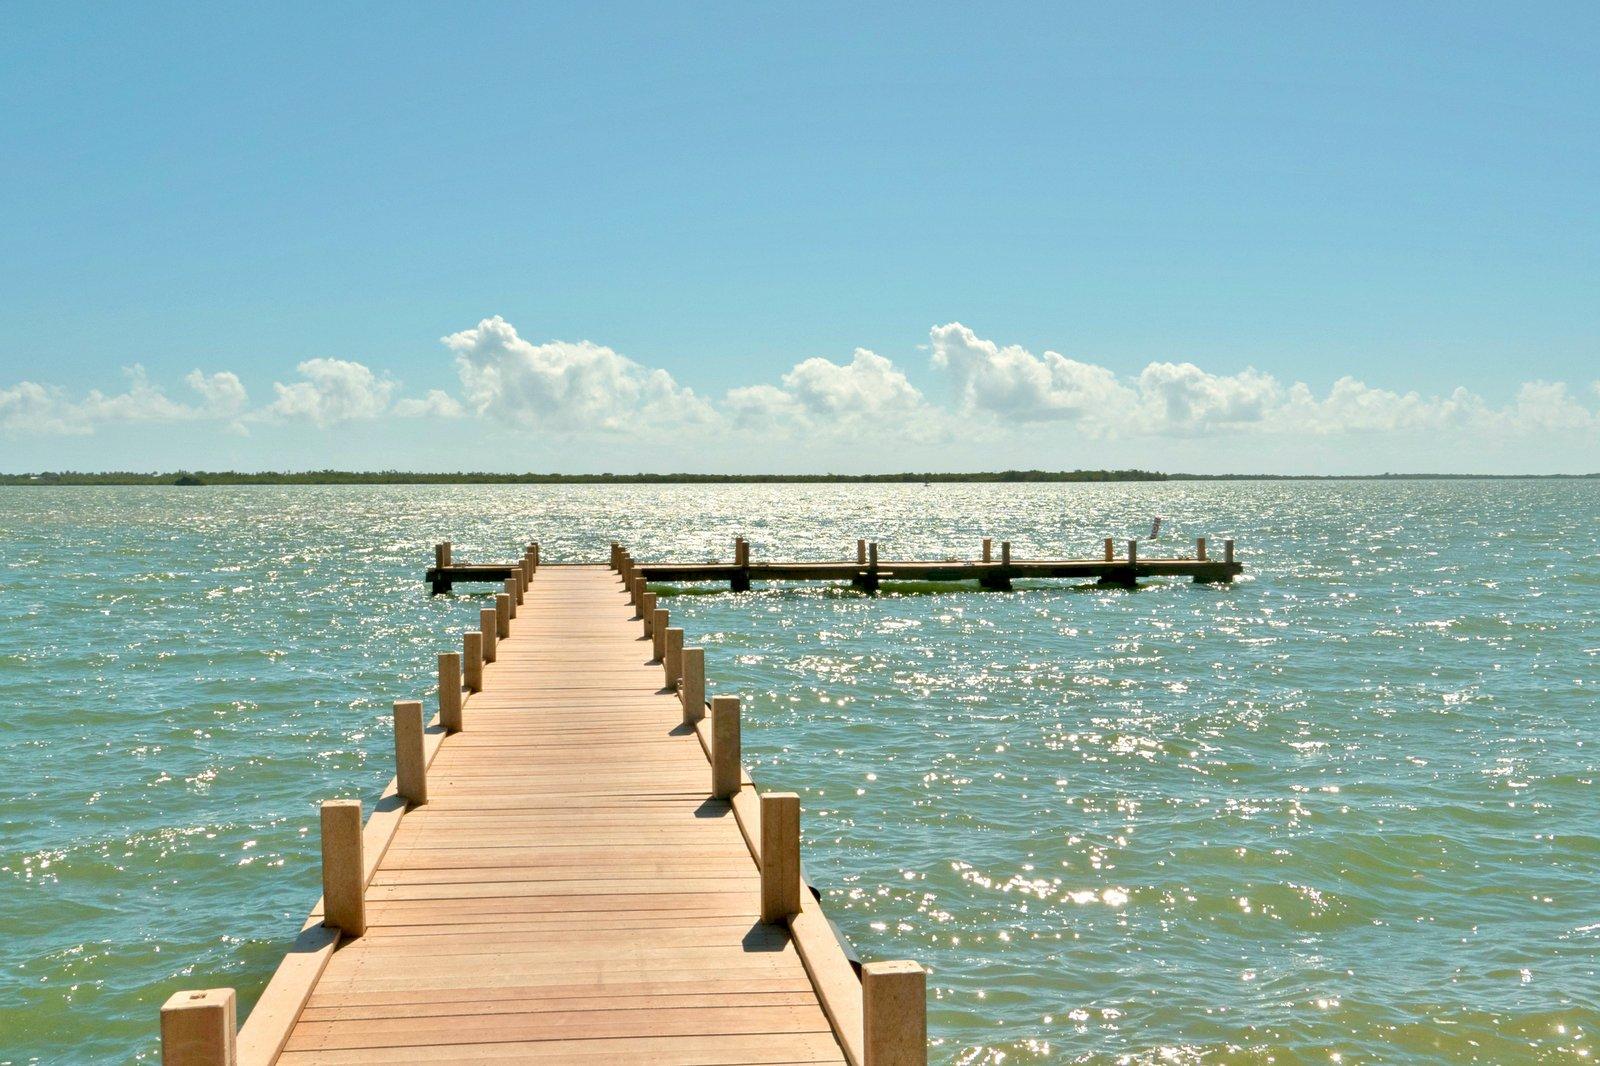 Reserva Nacional de Investigación Estuarina de Bahía de Jobos (JBNERR)